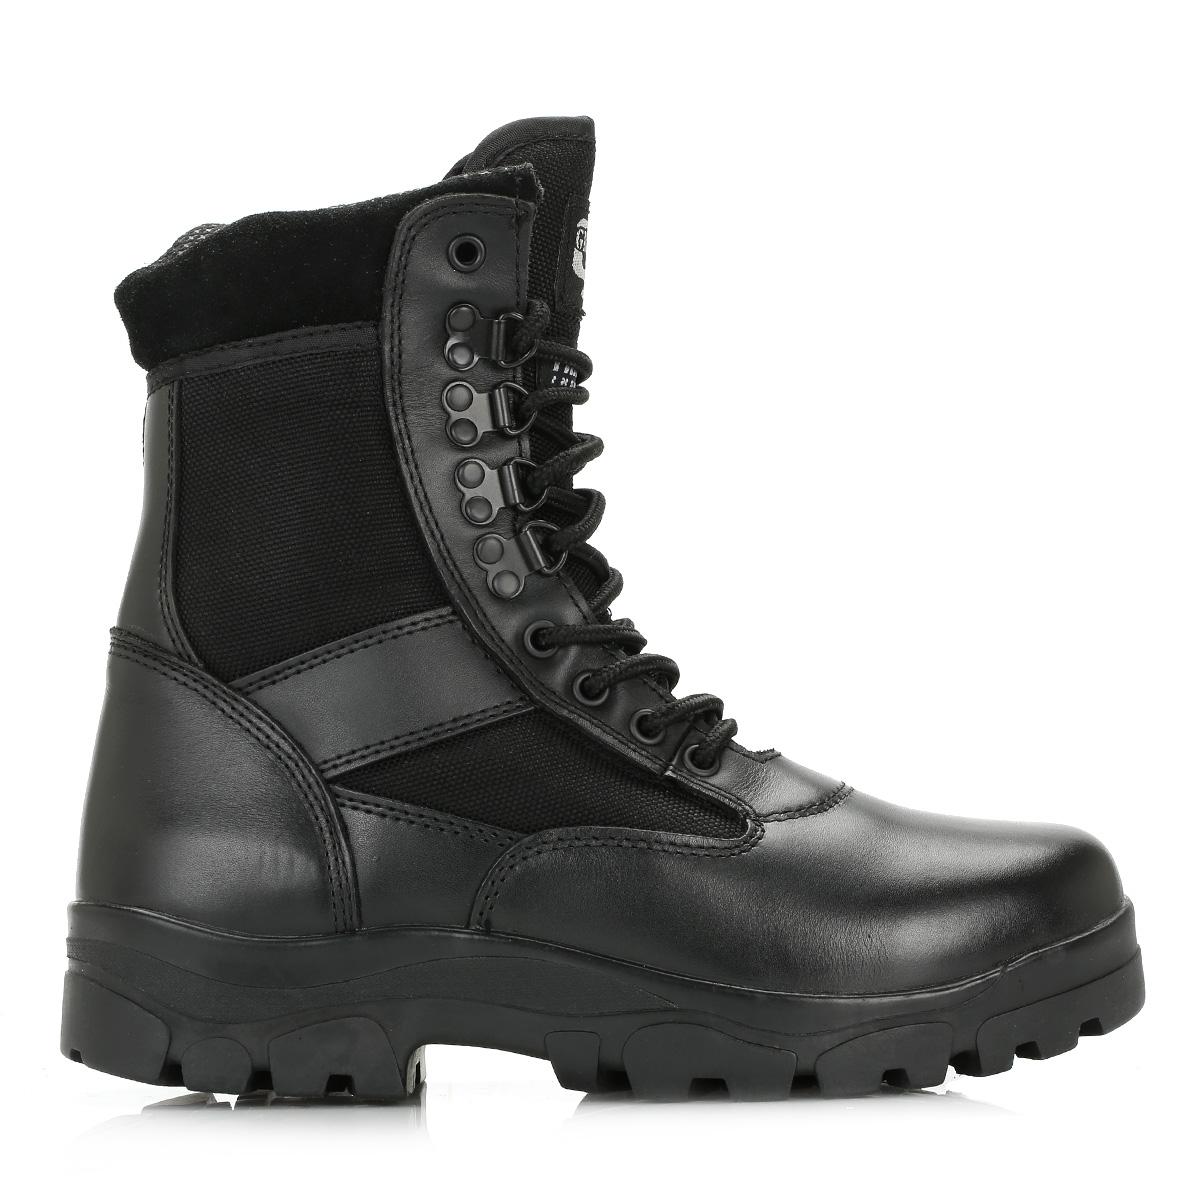 Mens Grafters Waterproof Combat Boots Size Uk 3 - 12 Non-Metallic Black M107a Kd-Uk 10 (eu 44) IPpp39